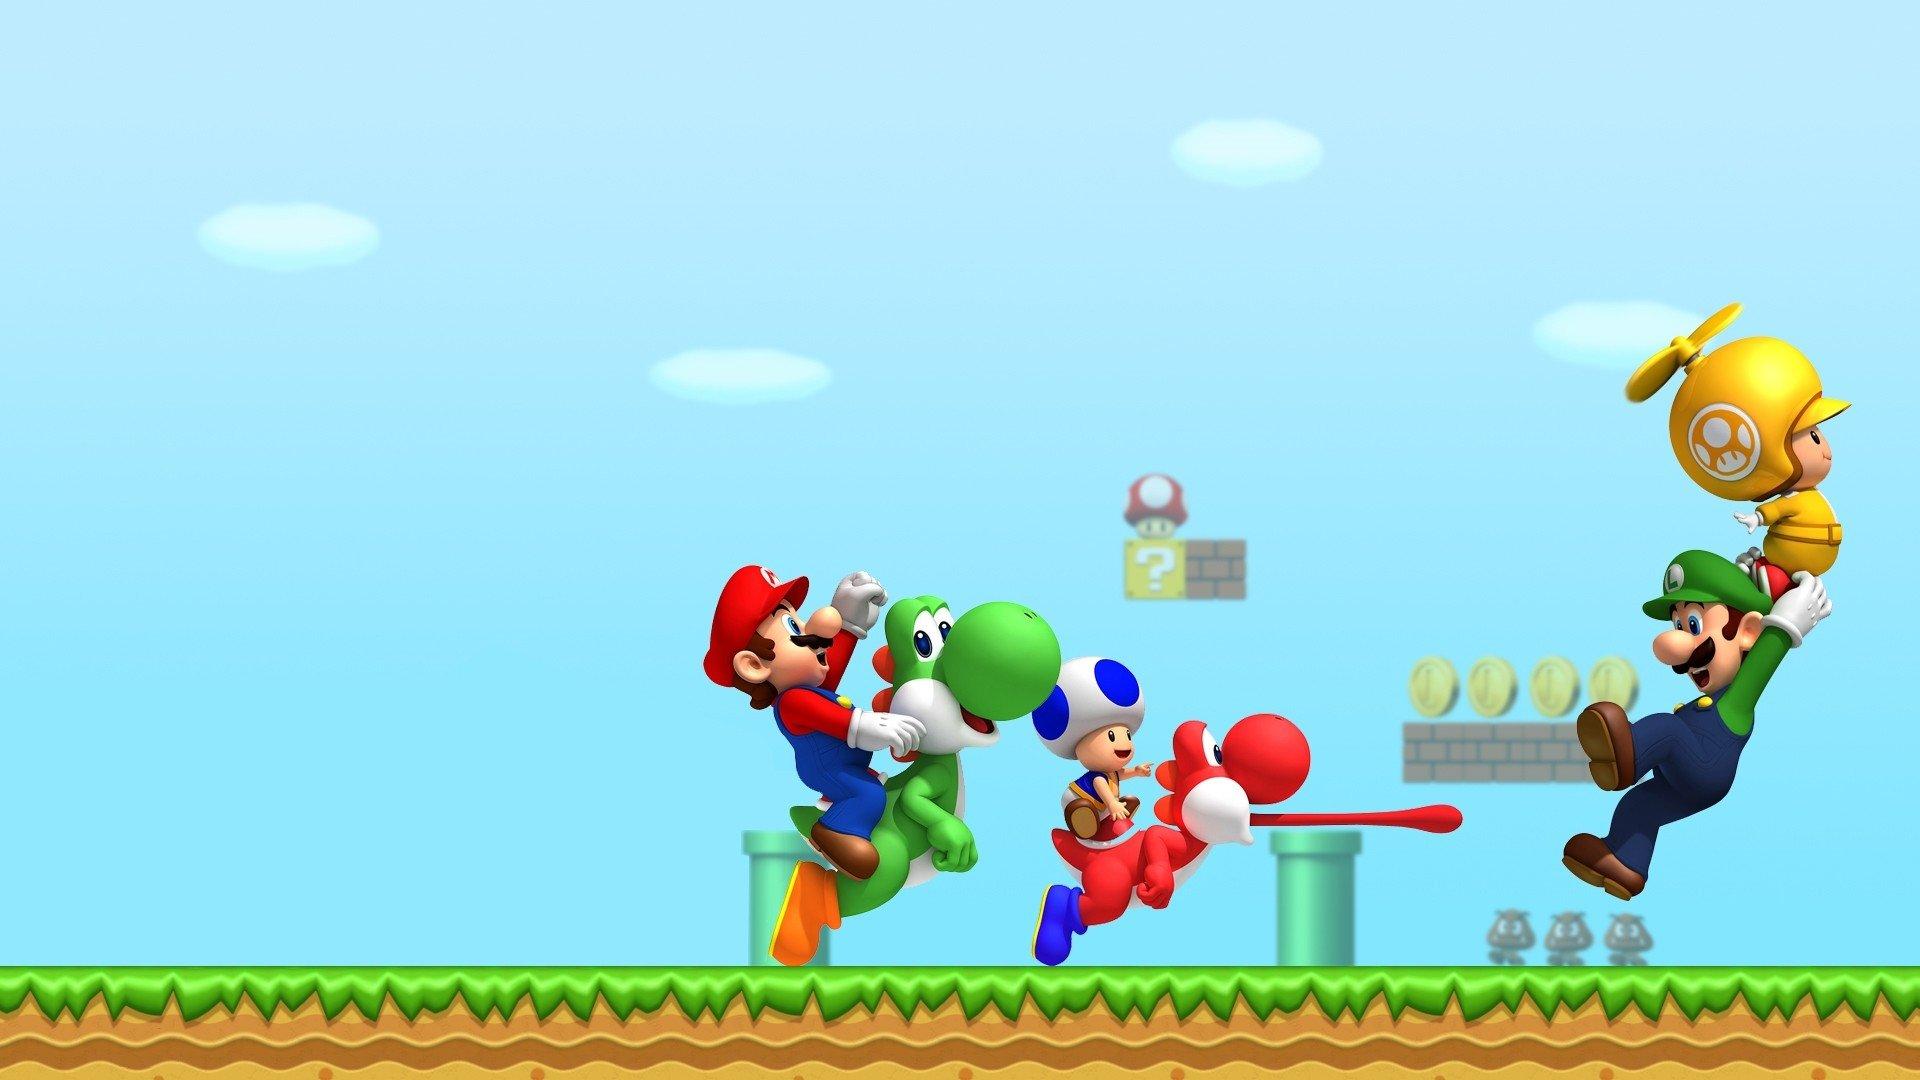 Video Game - New Super Mario Bros. Wii  Mario Yoshi Toad (Mario) Luigi Wallpaper